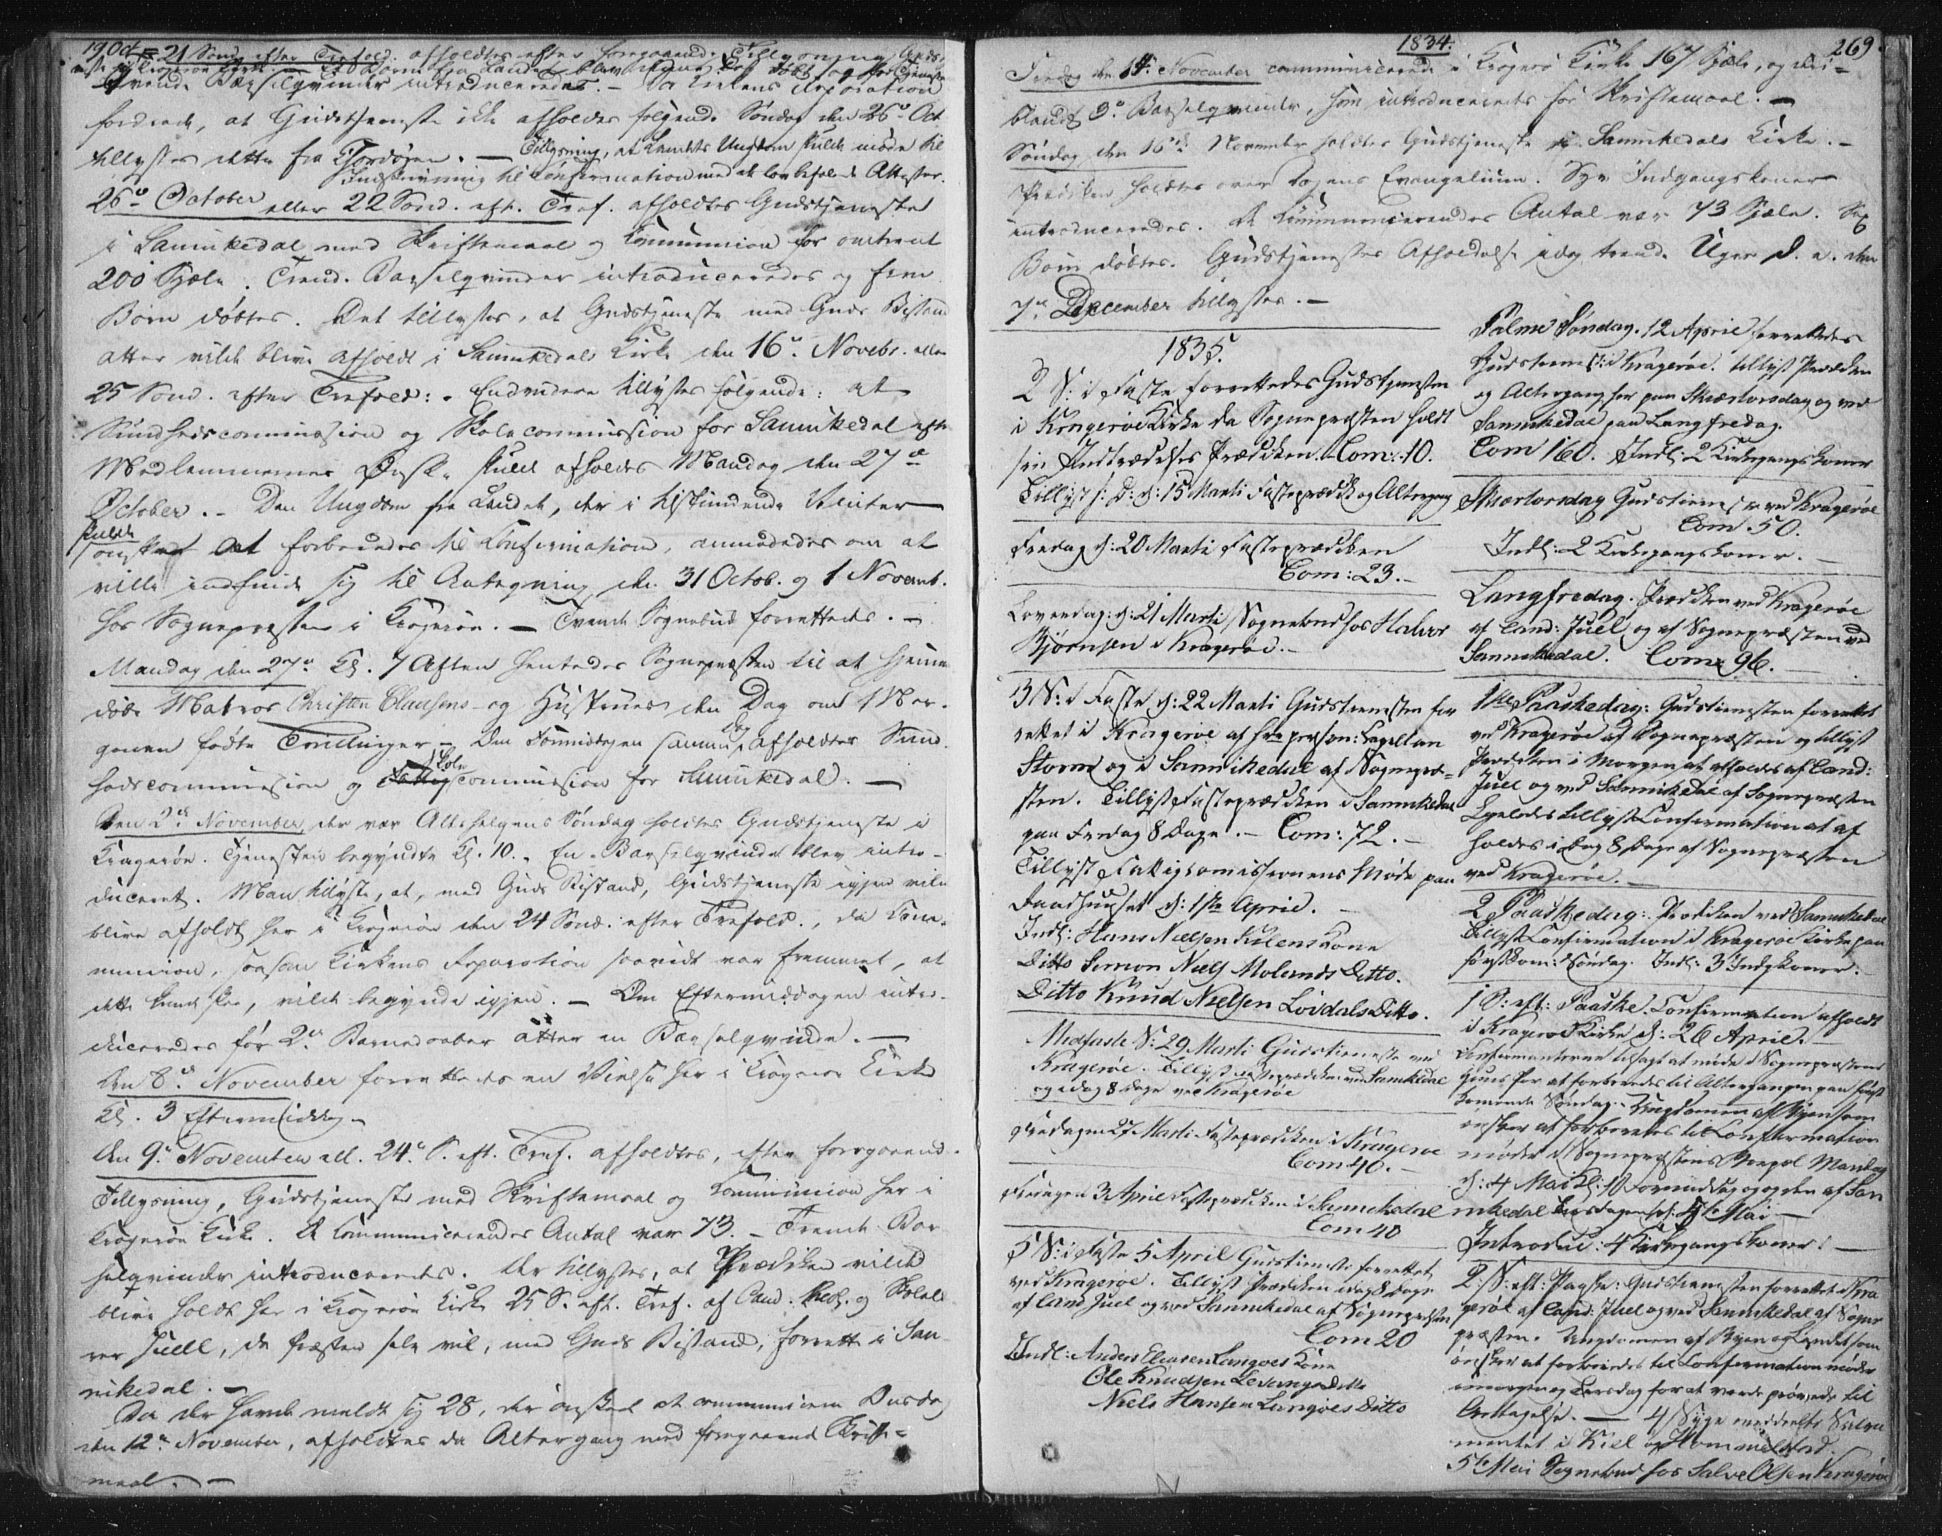 SAKO, Kragerø kirkebøker, F/Fa/L0005: Ministerialbok nr. 5, 1832-1847, s. 269